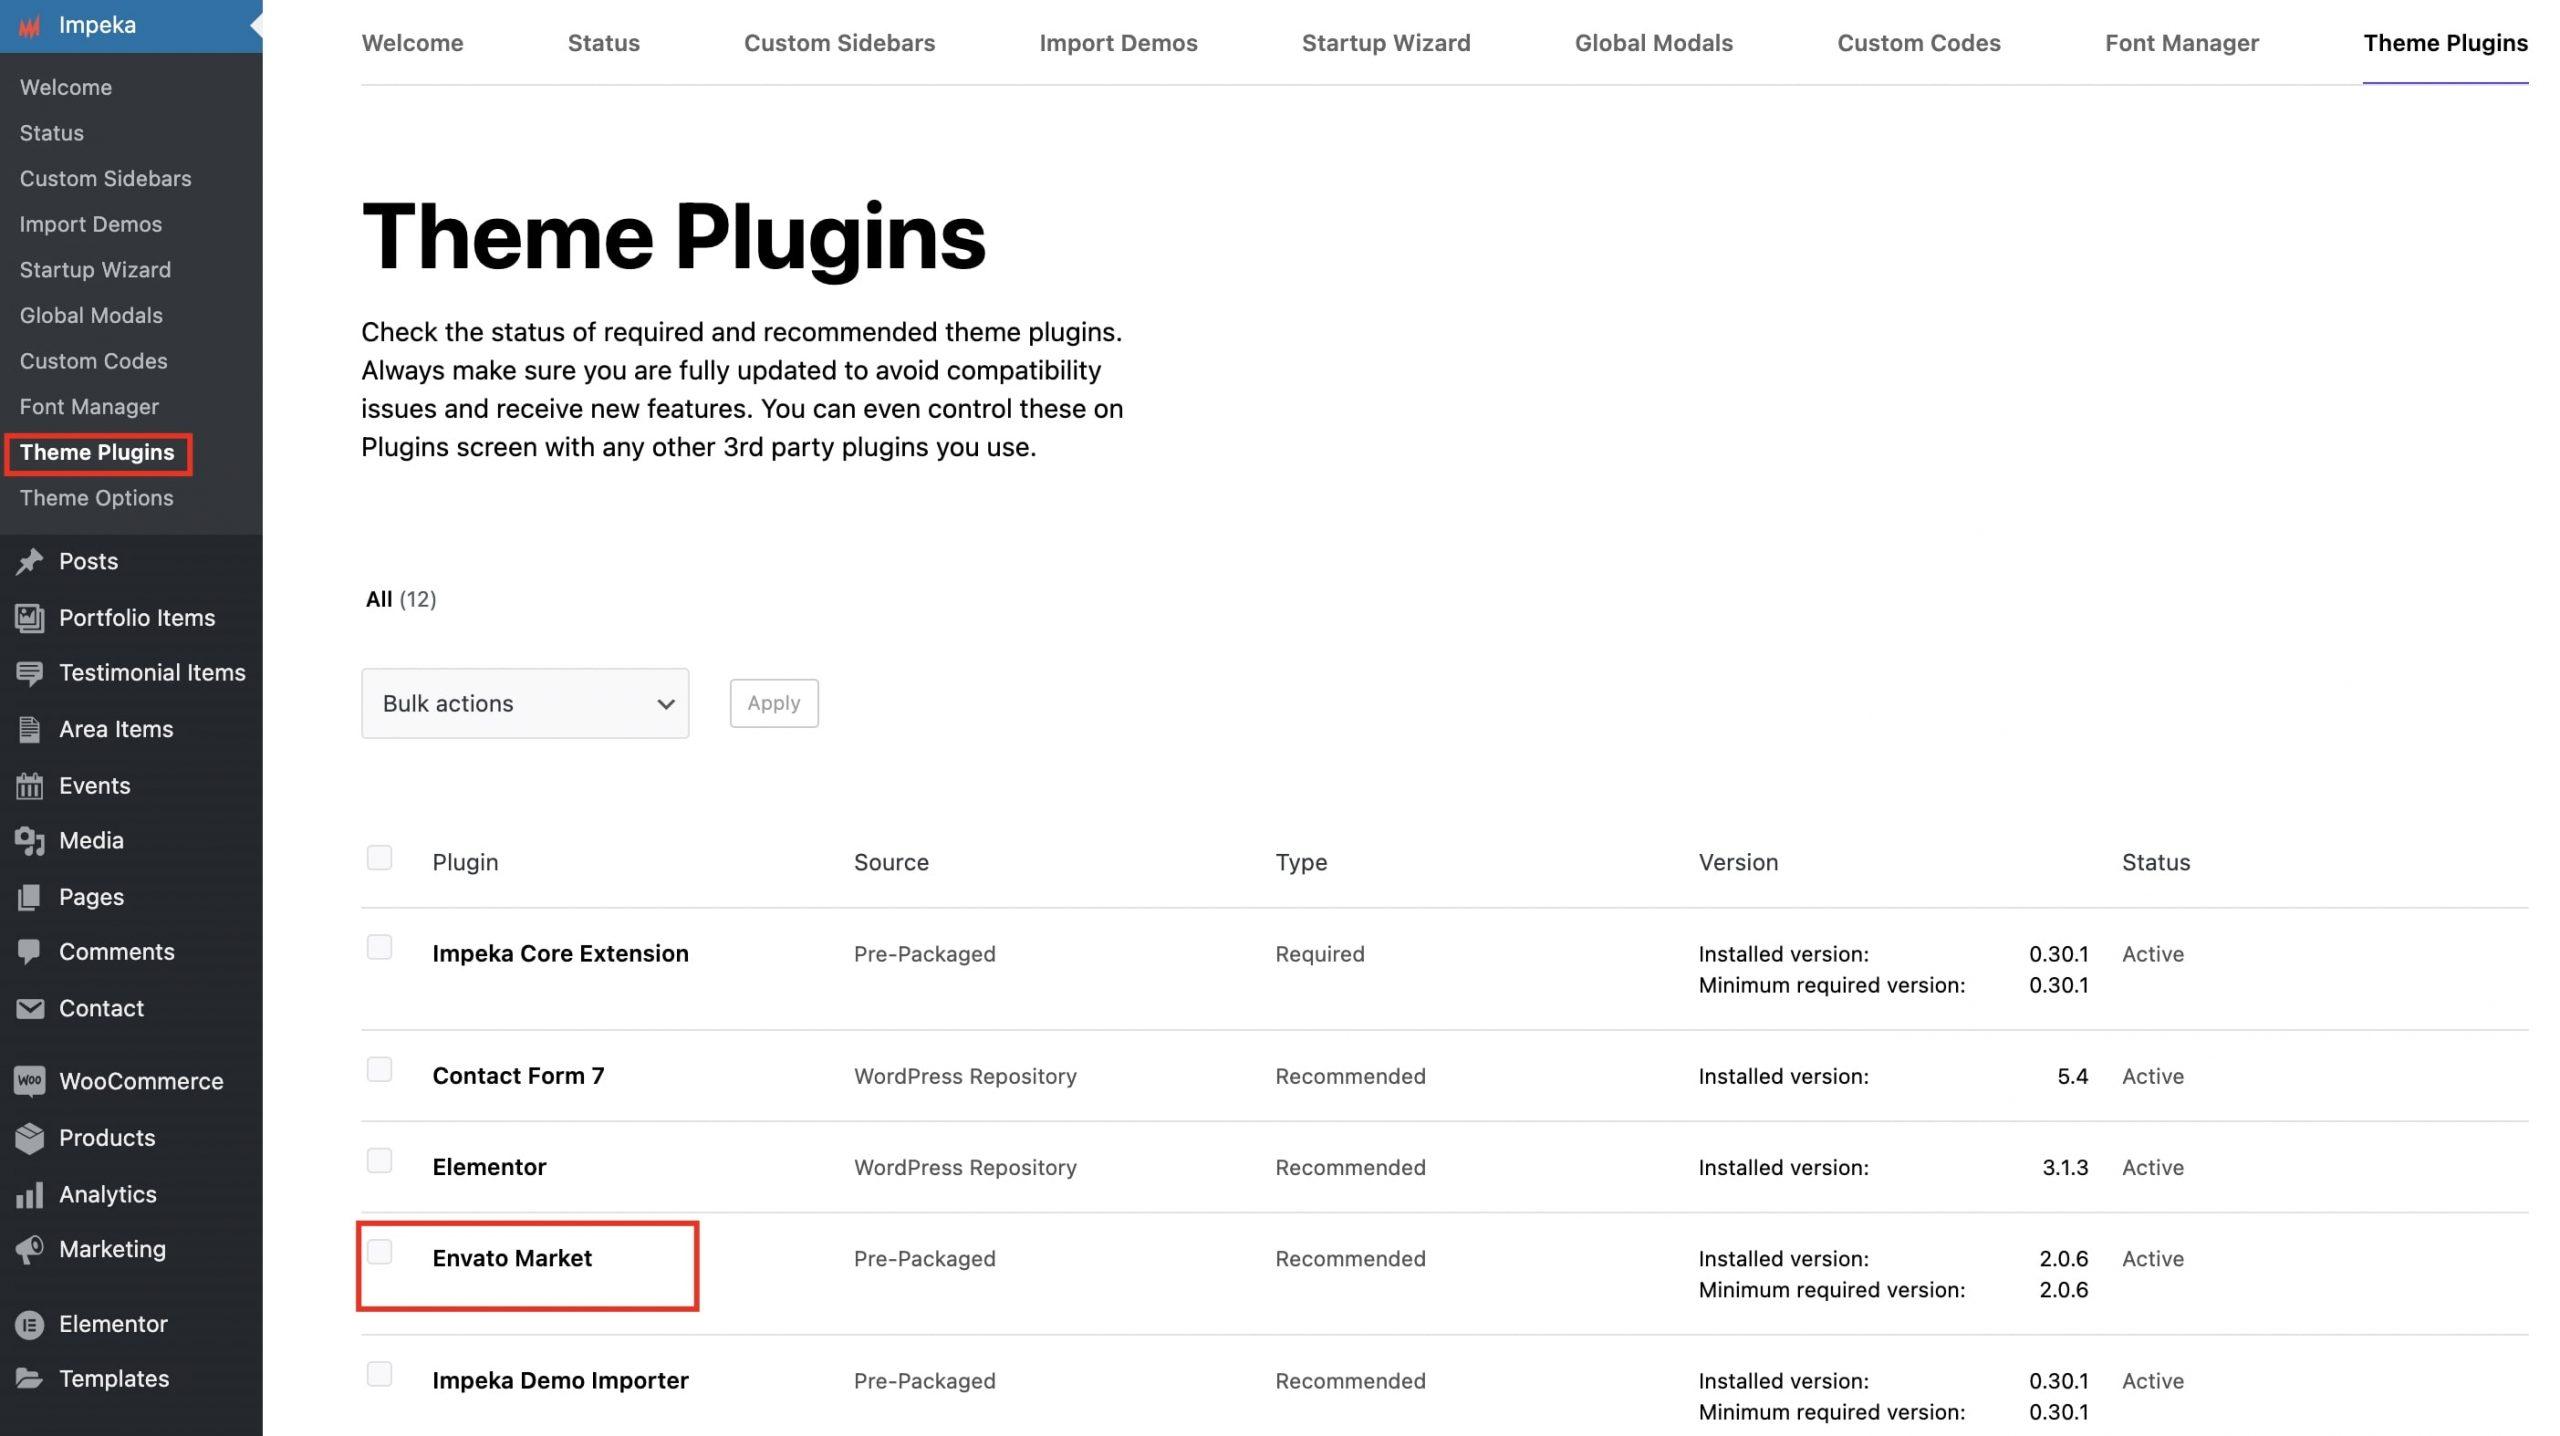 Envato Market plugin in Impeka